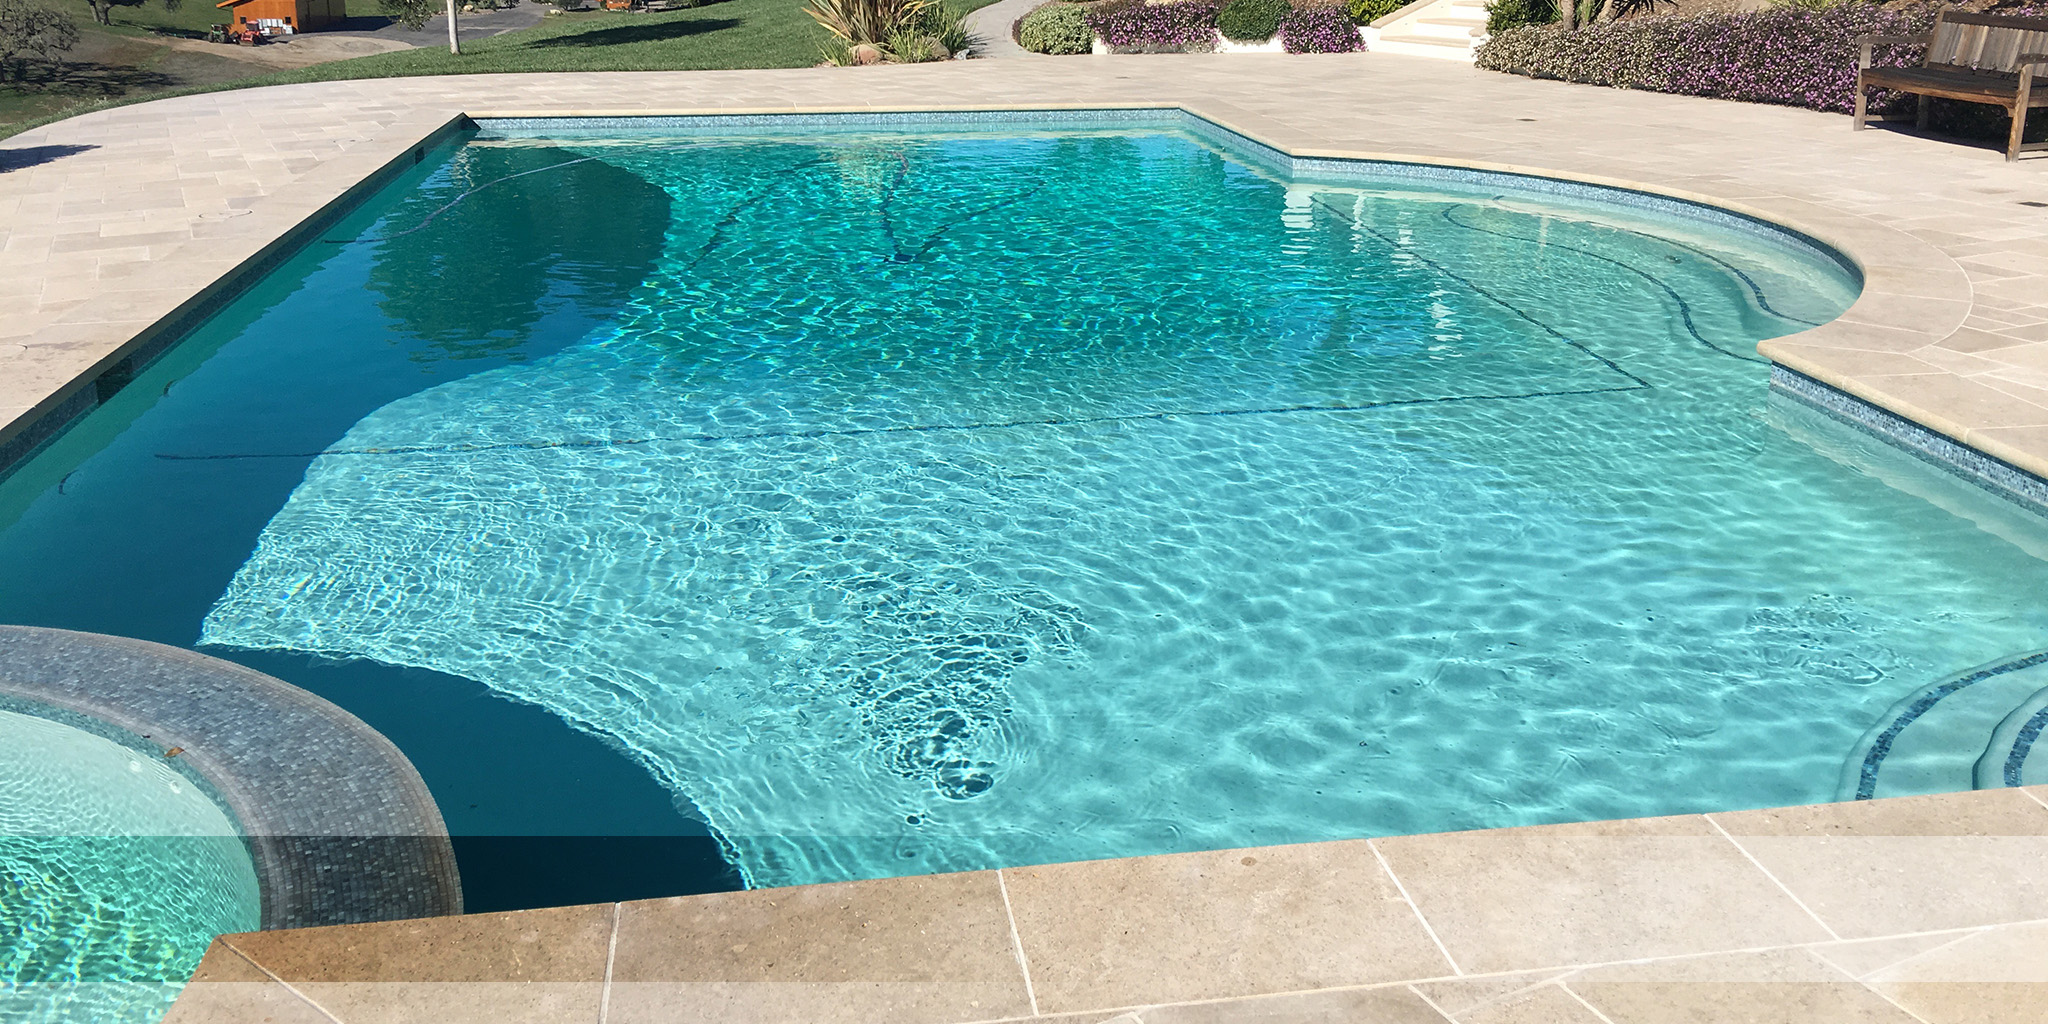 Joe Burich Pools And Spa